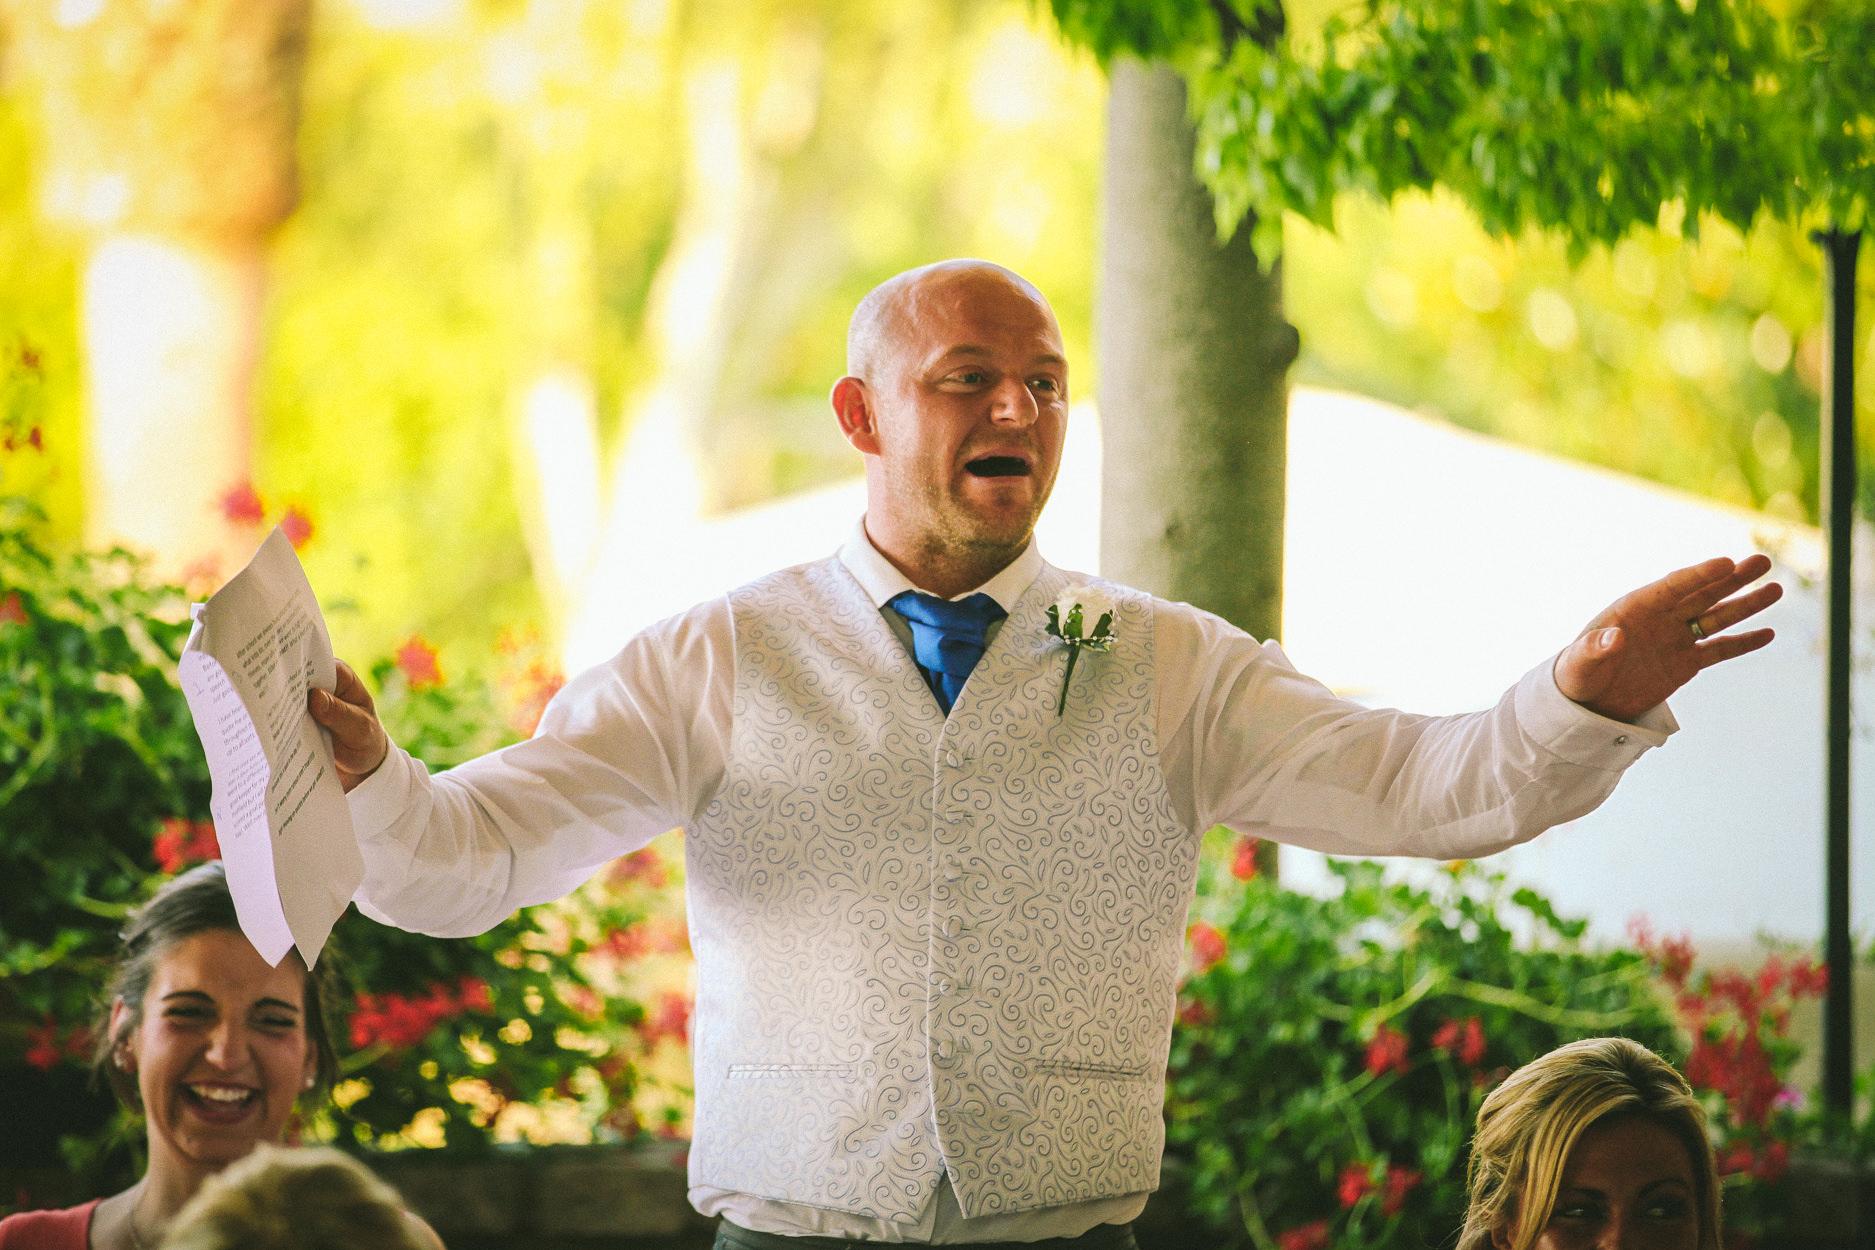 Amalfi-Coast-wedding-venue-Wedding-Photography-Villa Antiche Mura-Sorrento-Italy-19